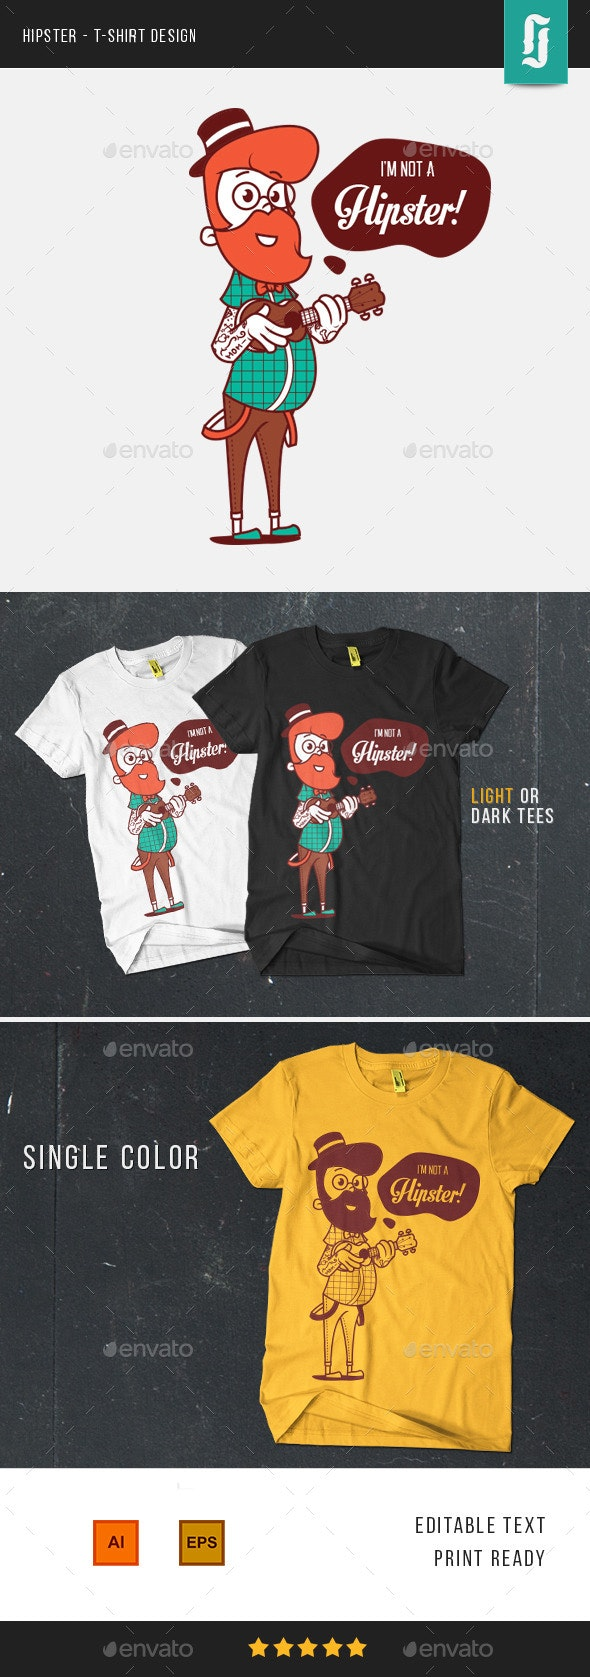 Hipster T-shirt Design - Funny Designs